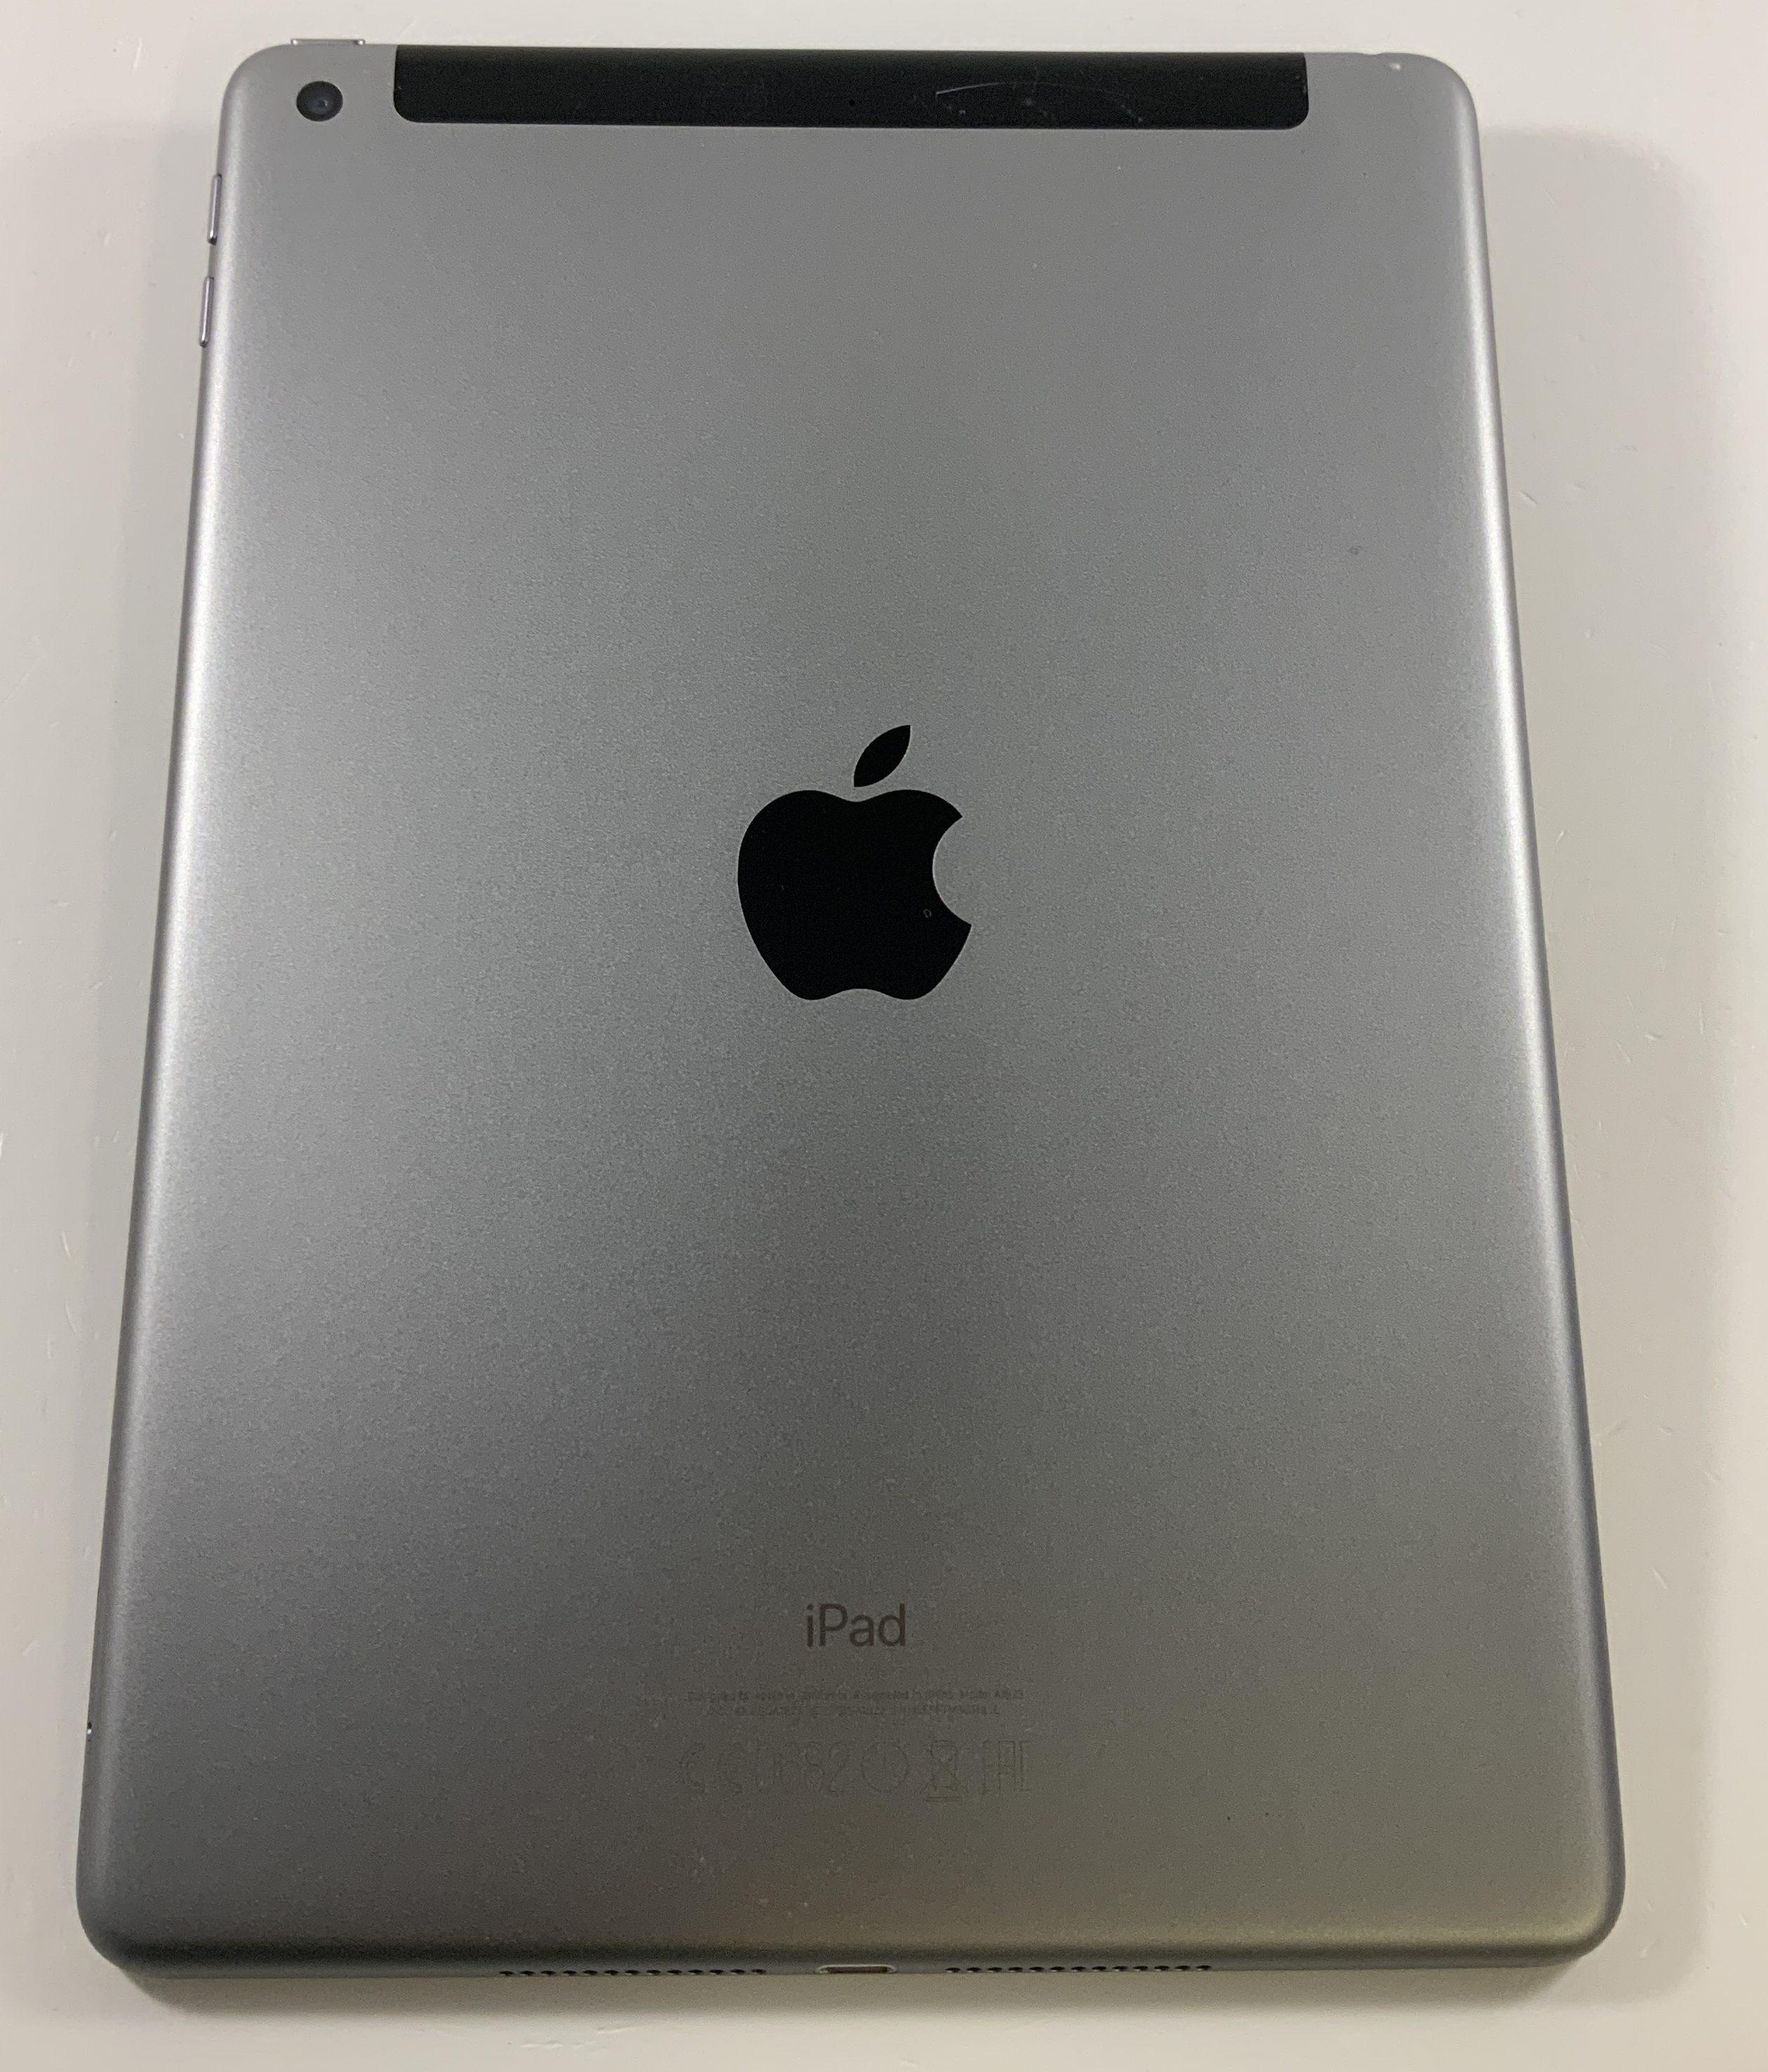 iPad 5 Wi-Fi + Cellular 128GB, 128GB, Space Gray, imagen 2